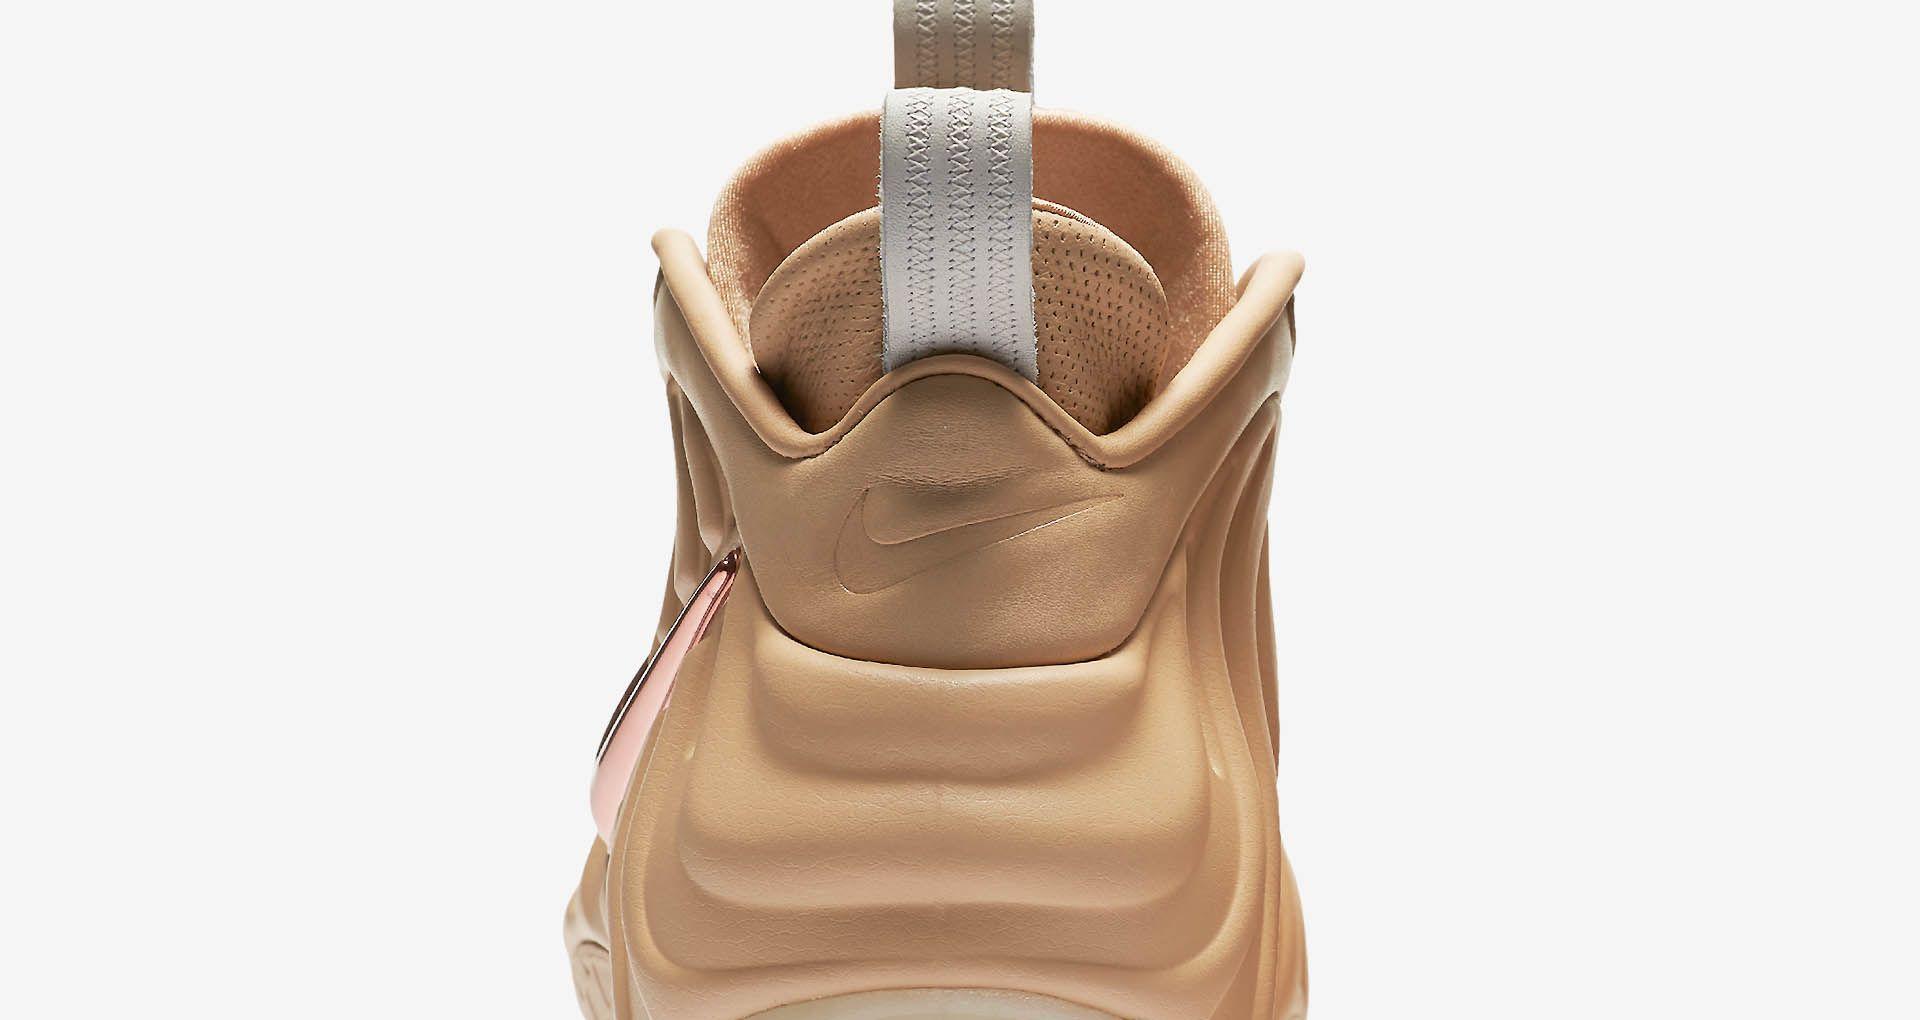 c8de9bd950f Nike Air Foamposite Pro  Vachetta Tan   Rose Gold . Nike+ SNKRS